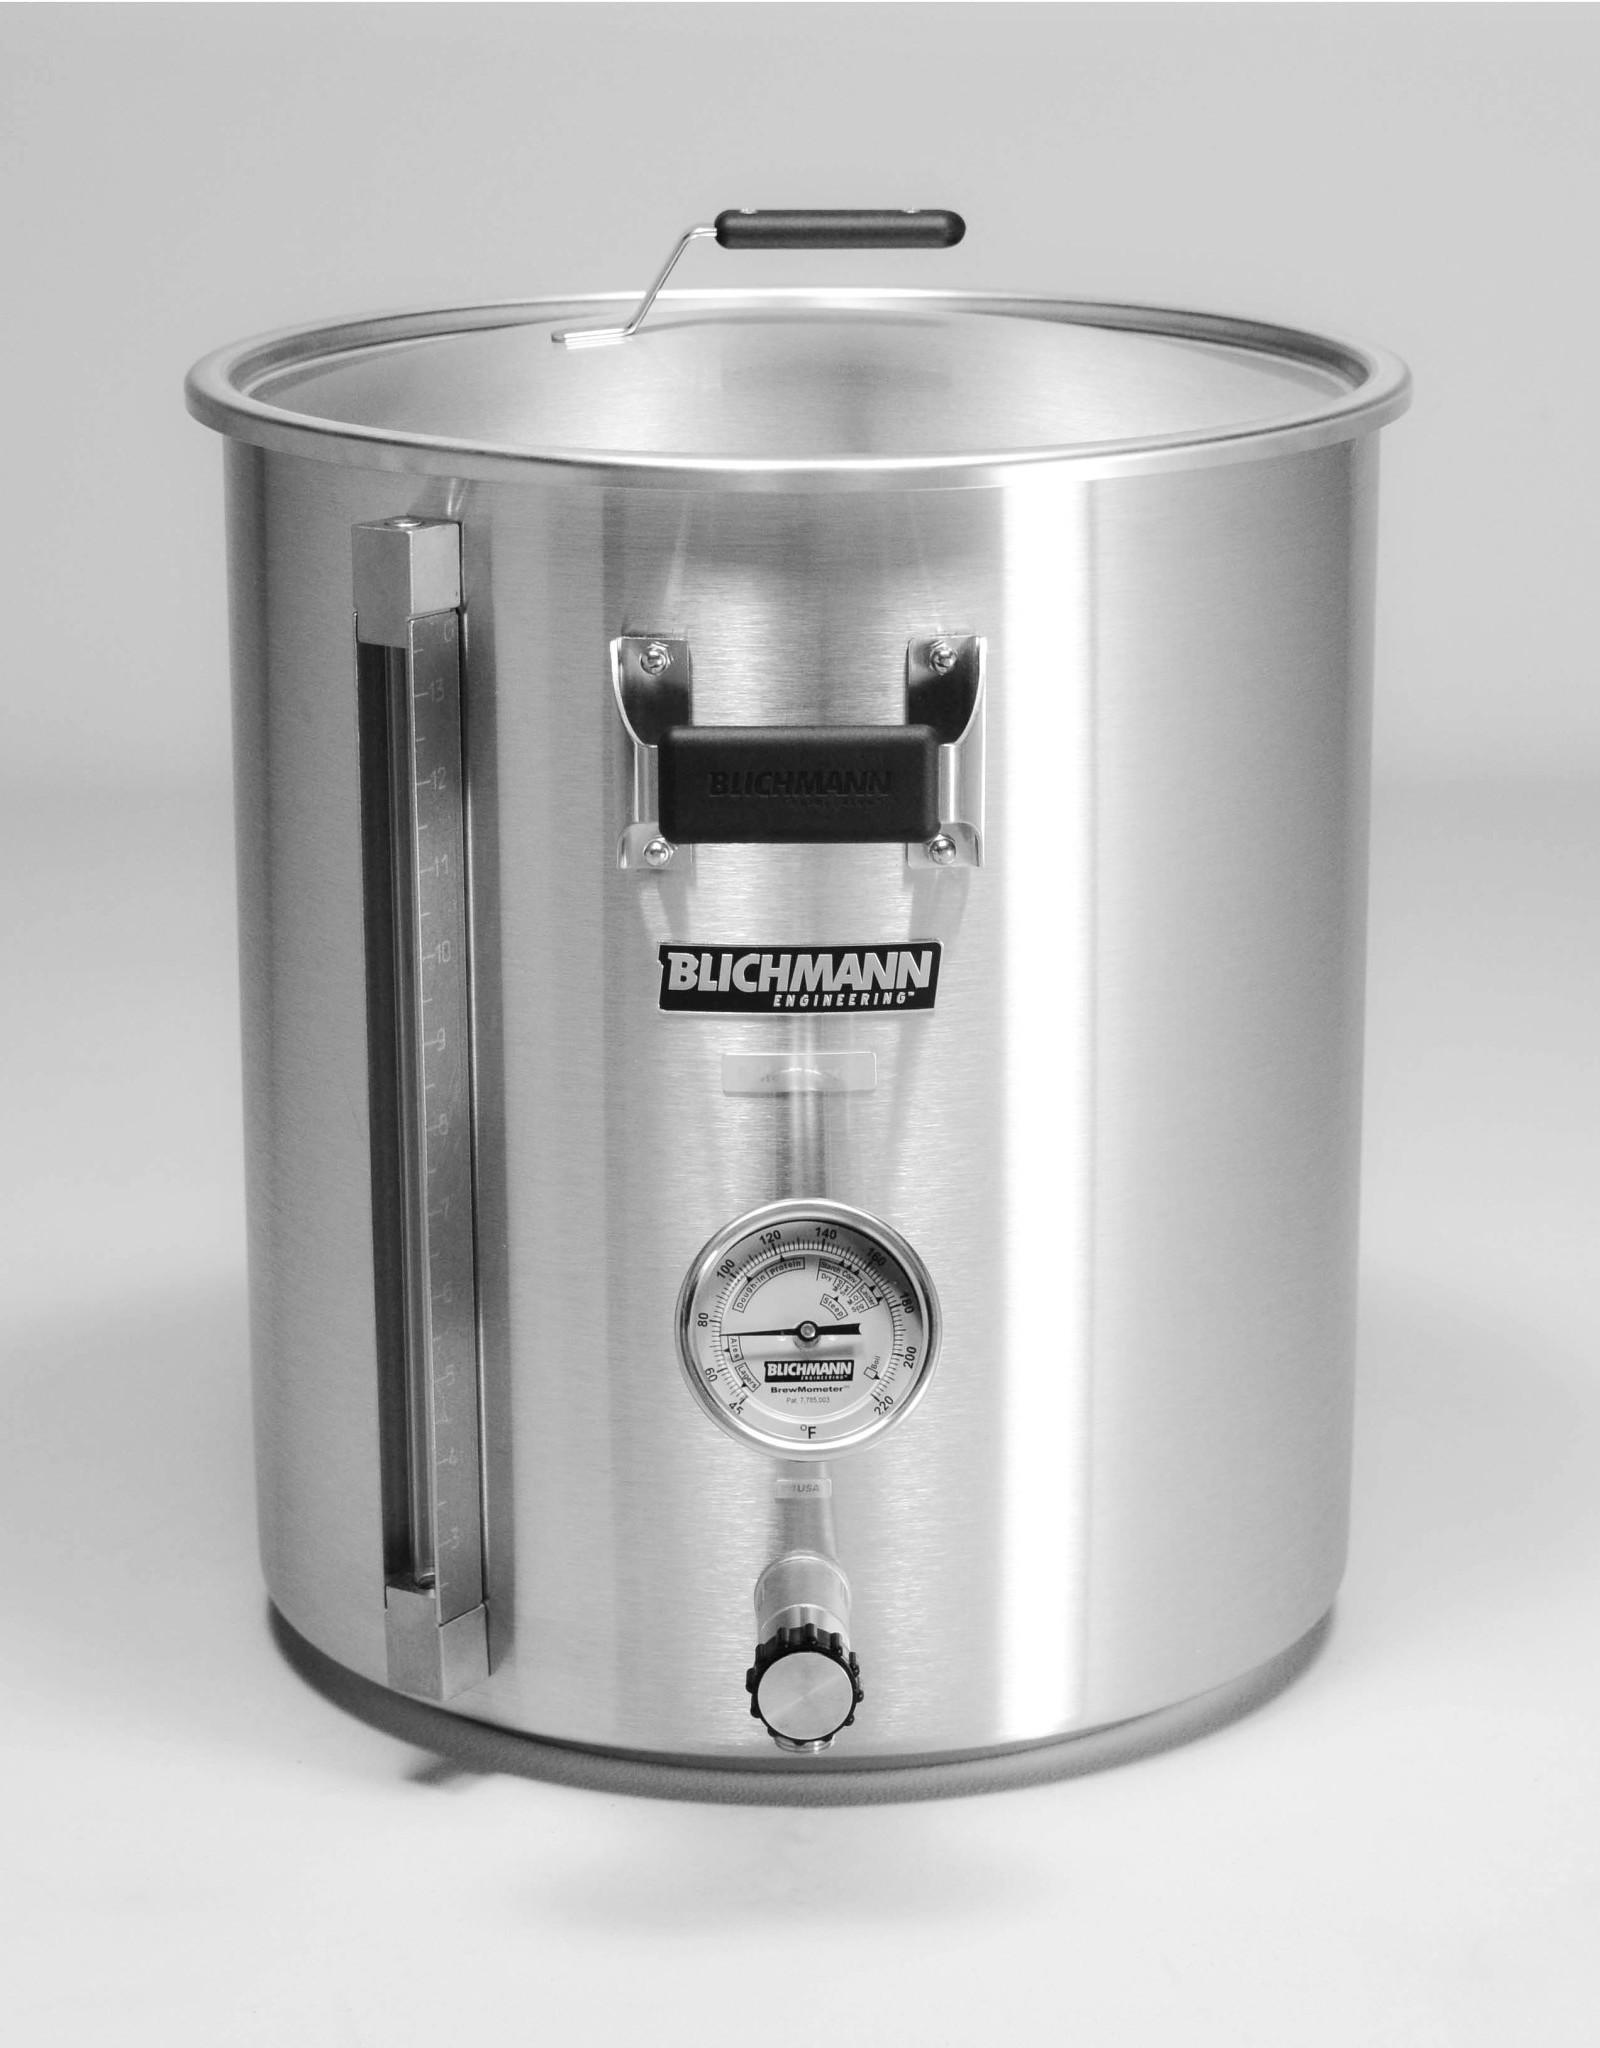 G2 BoilerMaker Brew Pot - 30 gallon - Fahrenheit